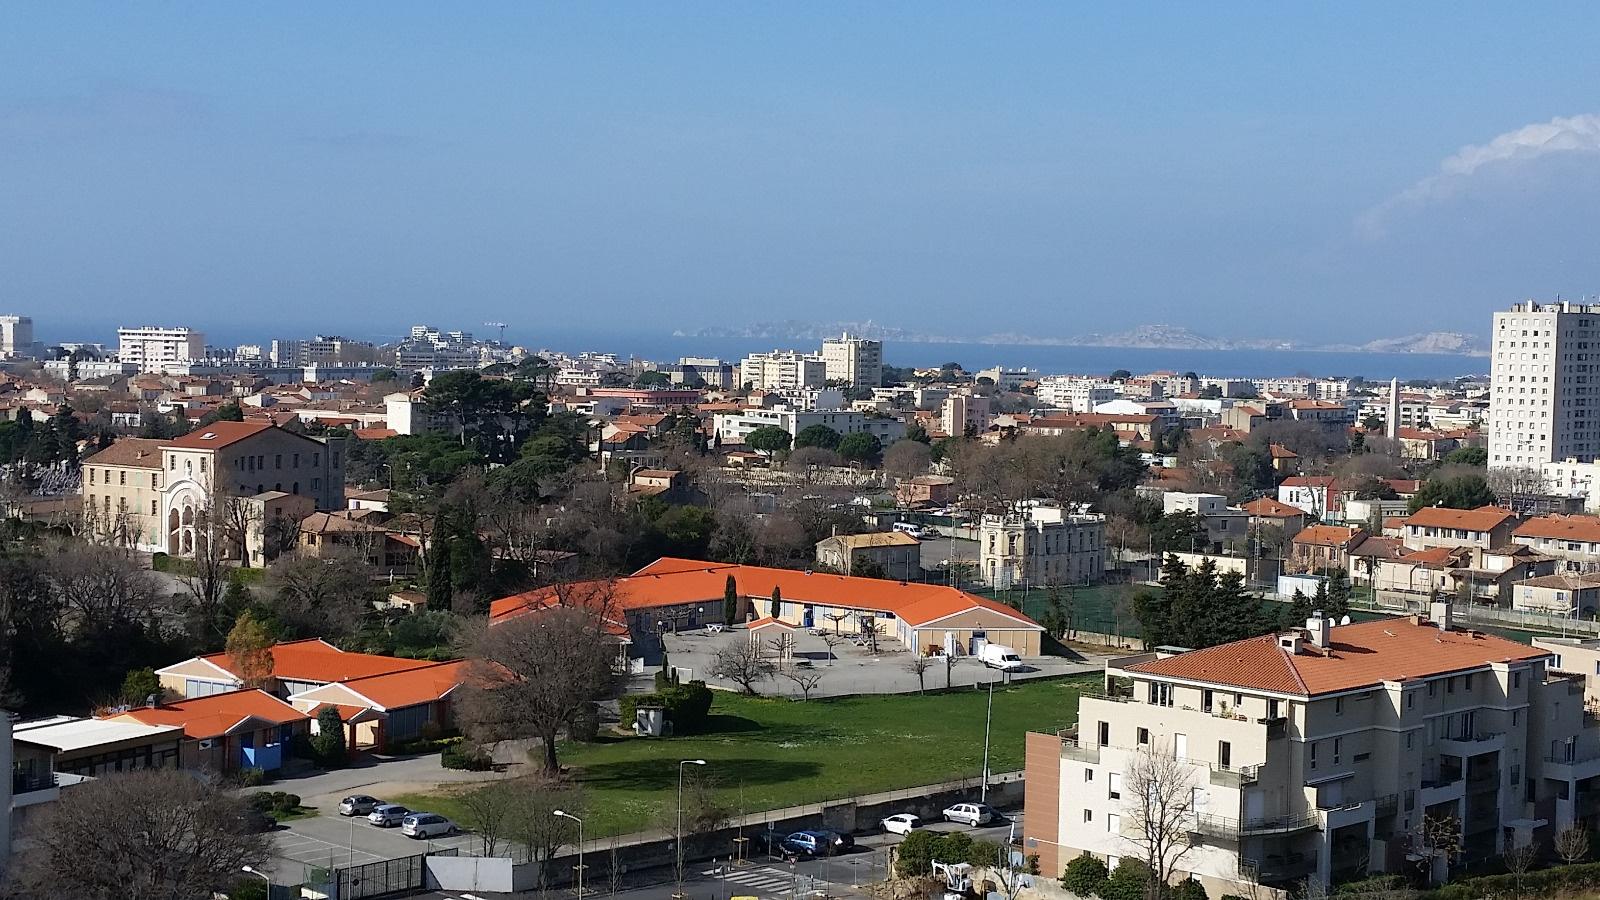 Vente appartement type 4 5 13009 marseille for Marseille appartement